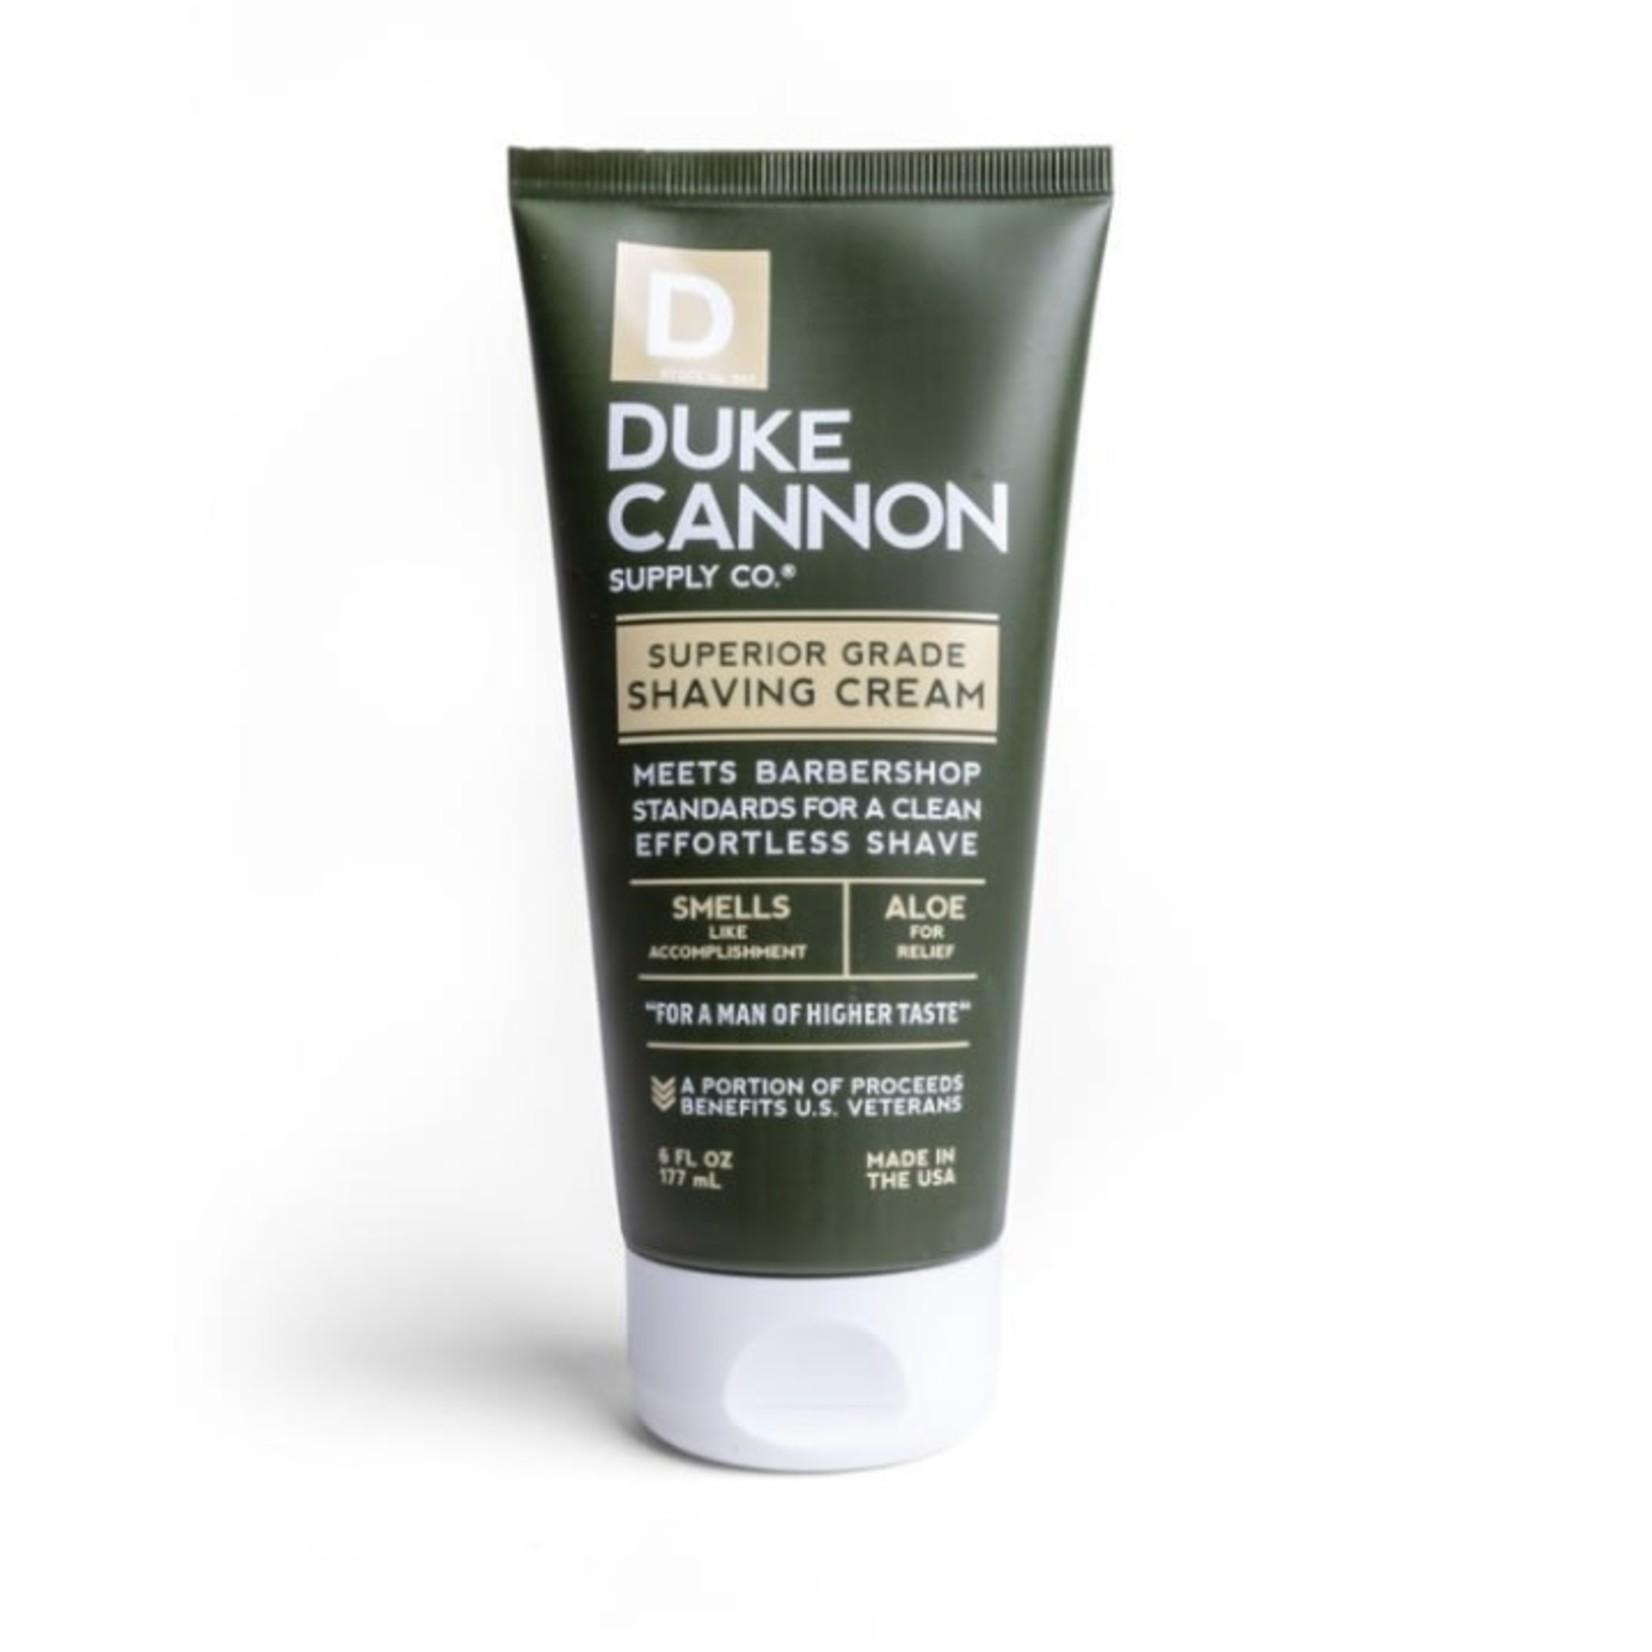 duke cannon Superior Shaving Cream